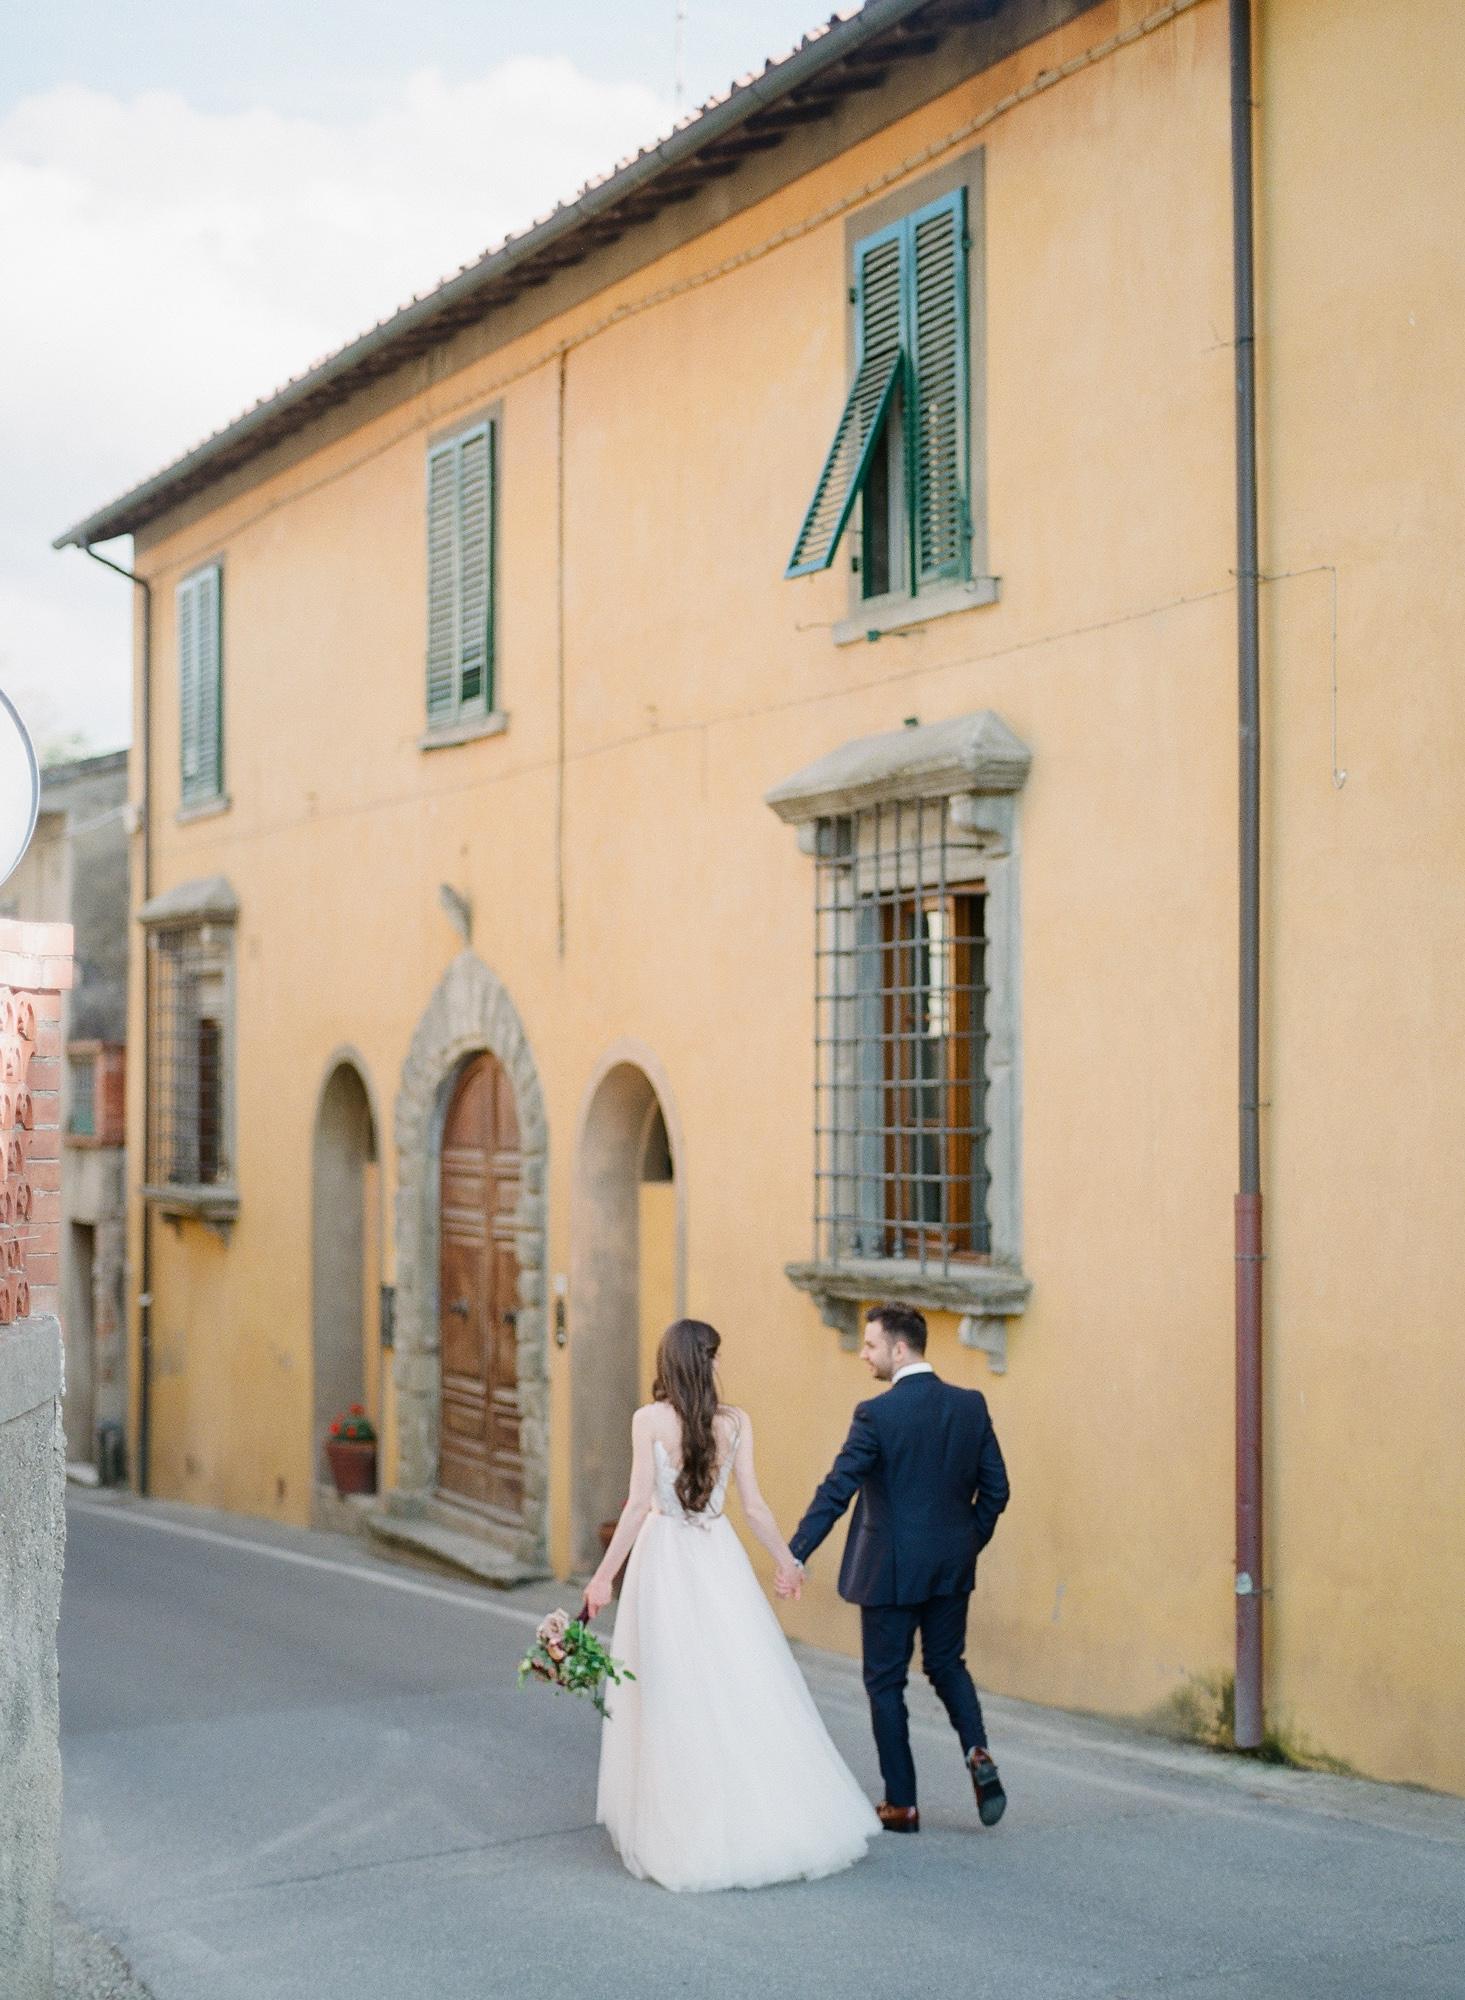 Tuscany-Wedding-Venues-22.jpg